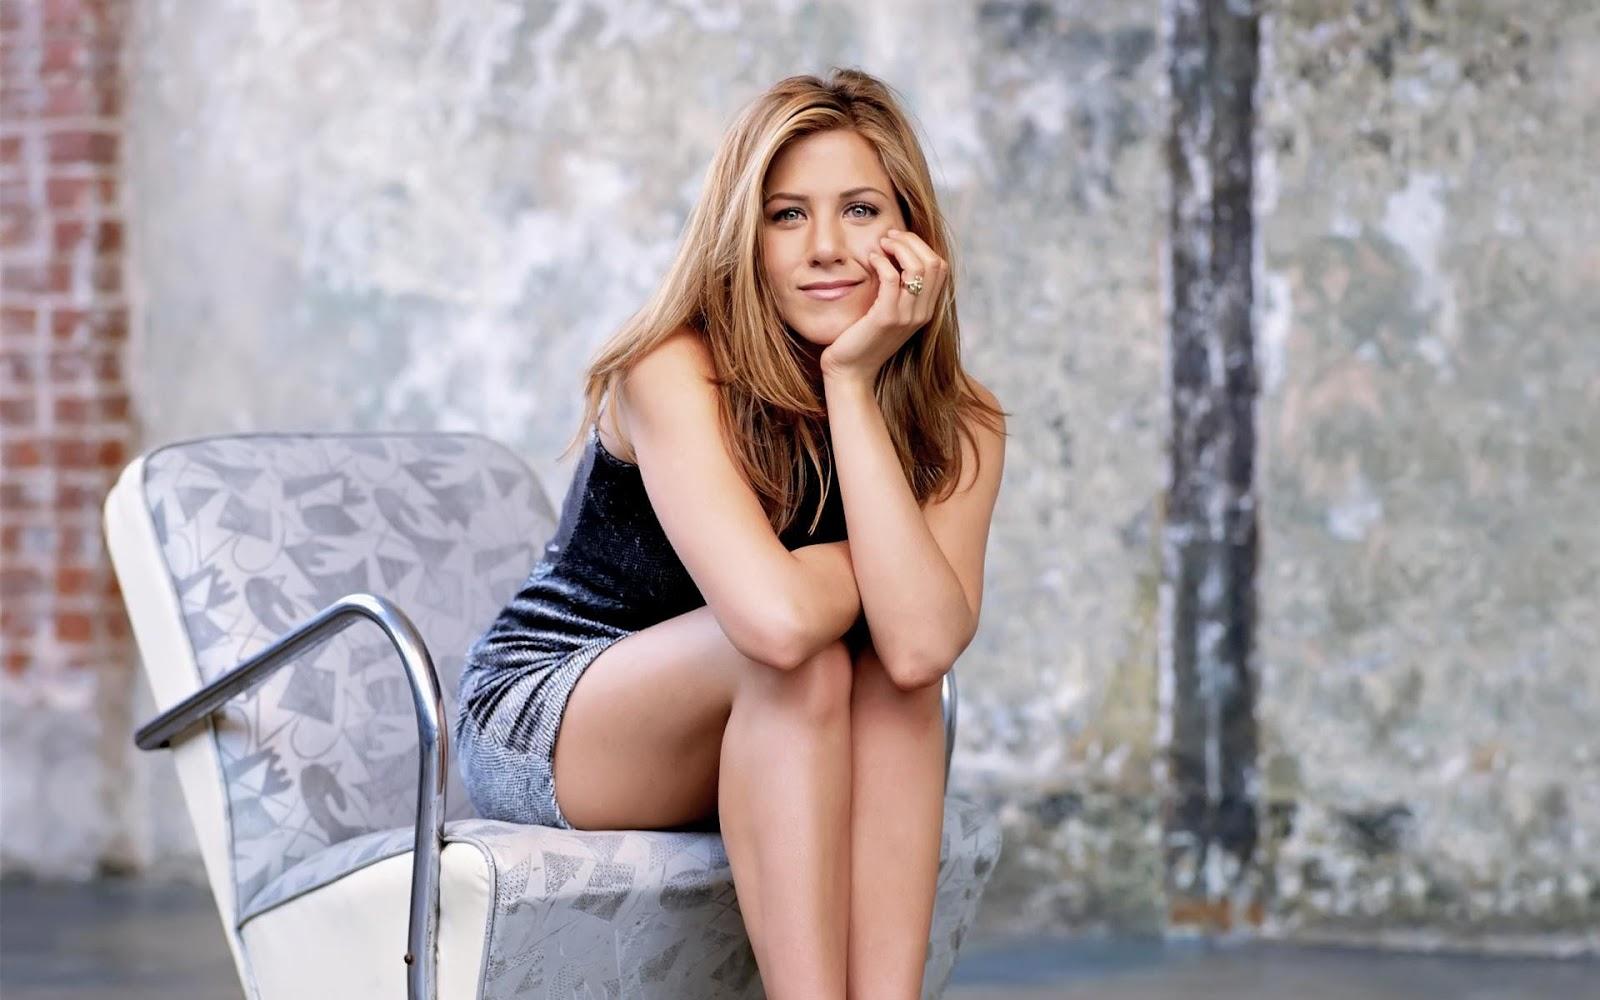 Jennifer Aniston - Jennifer Aniston mulai terkenal manis paha mulus